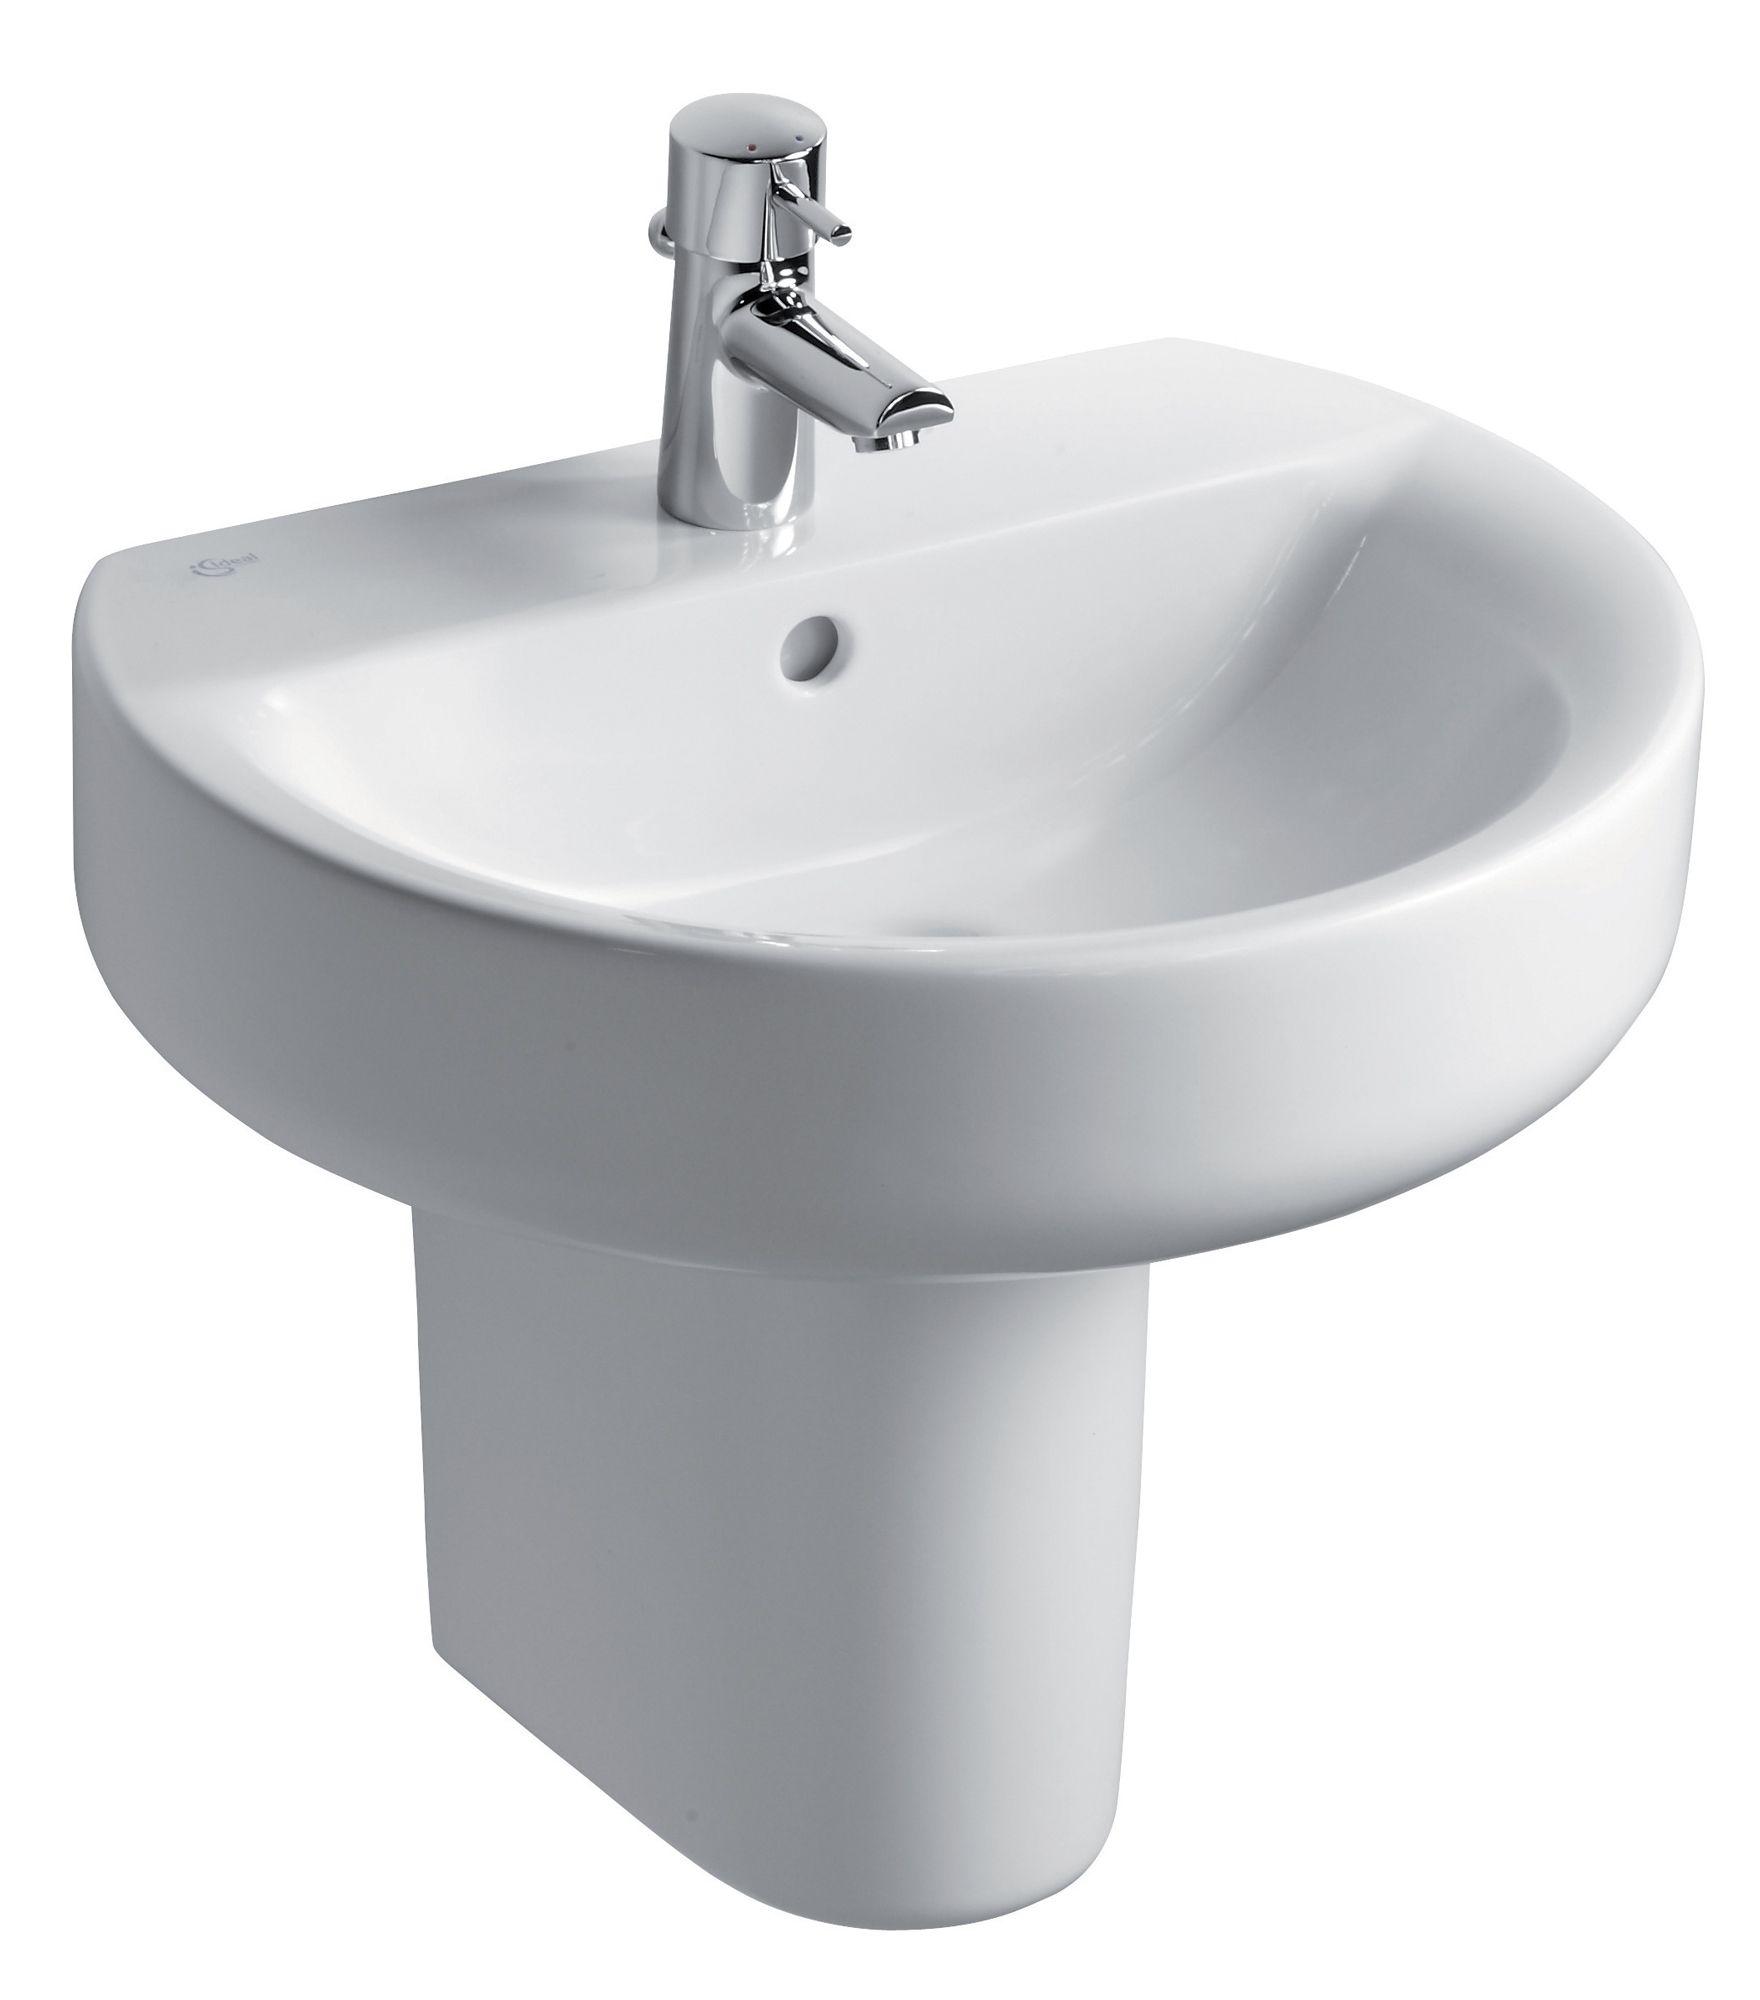 Bathroom Sinks B&Q Ireland ideal standard senses sphere semi pedestal basin | departments